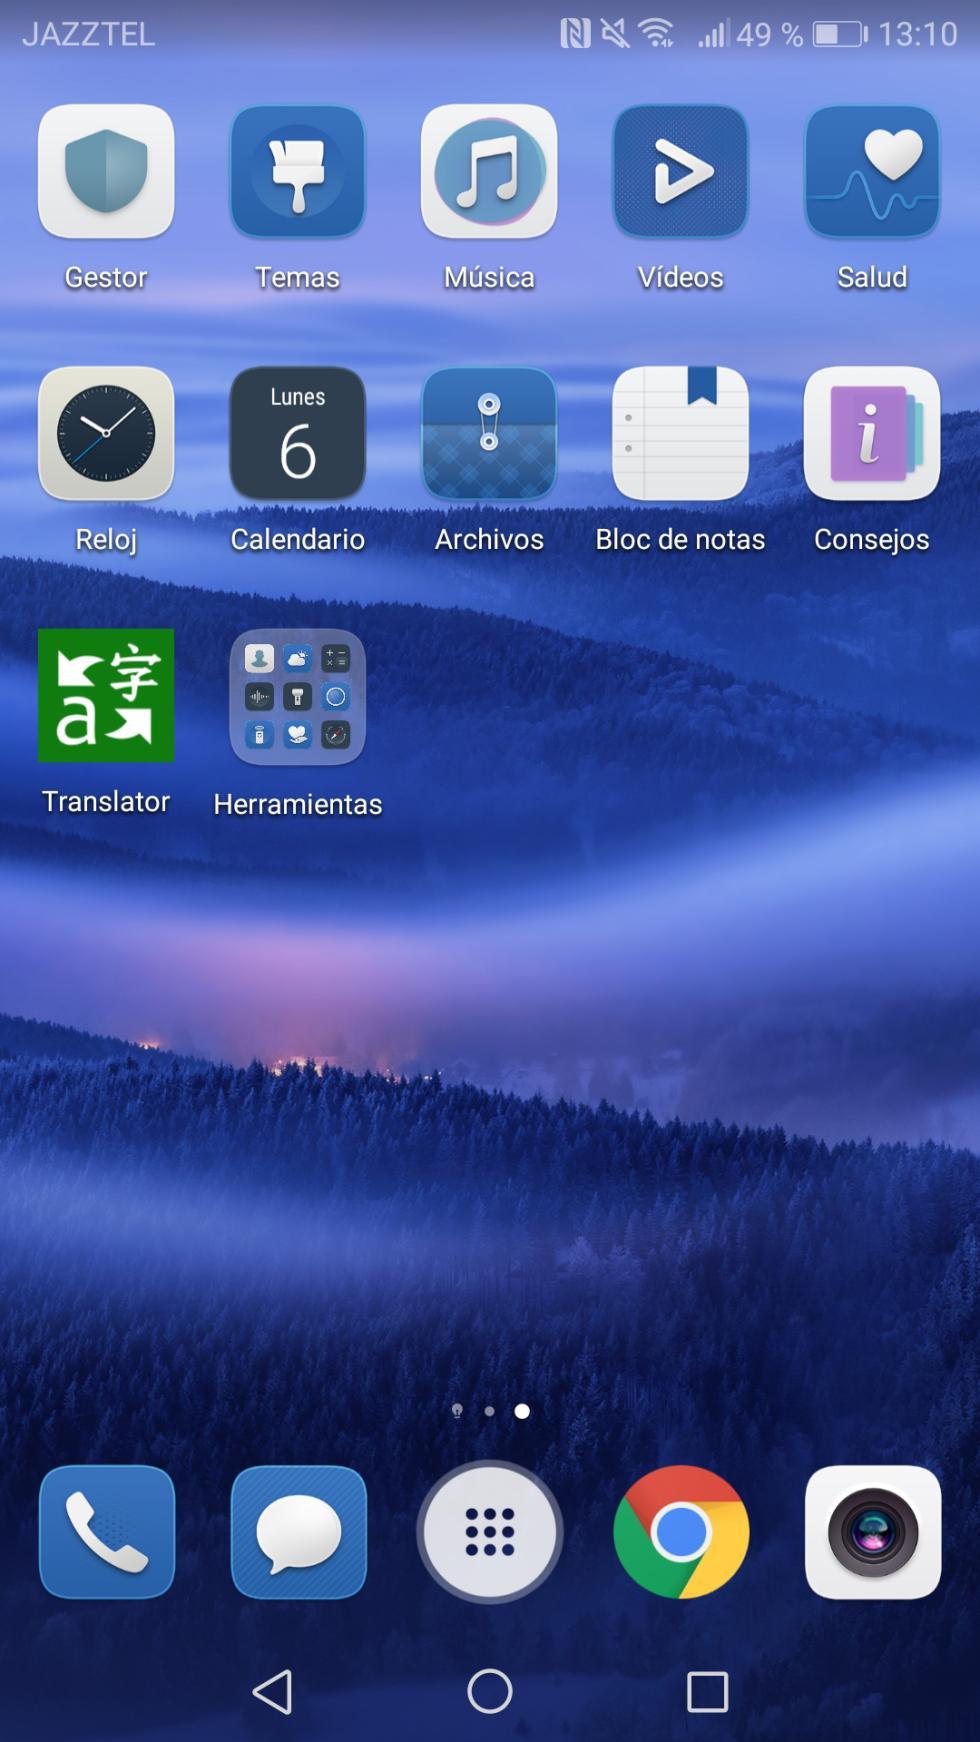 Interfaz del Huawei Mate 10